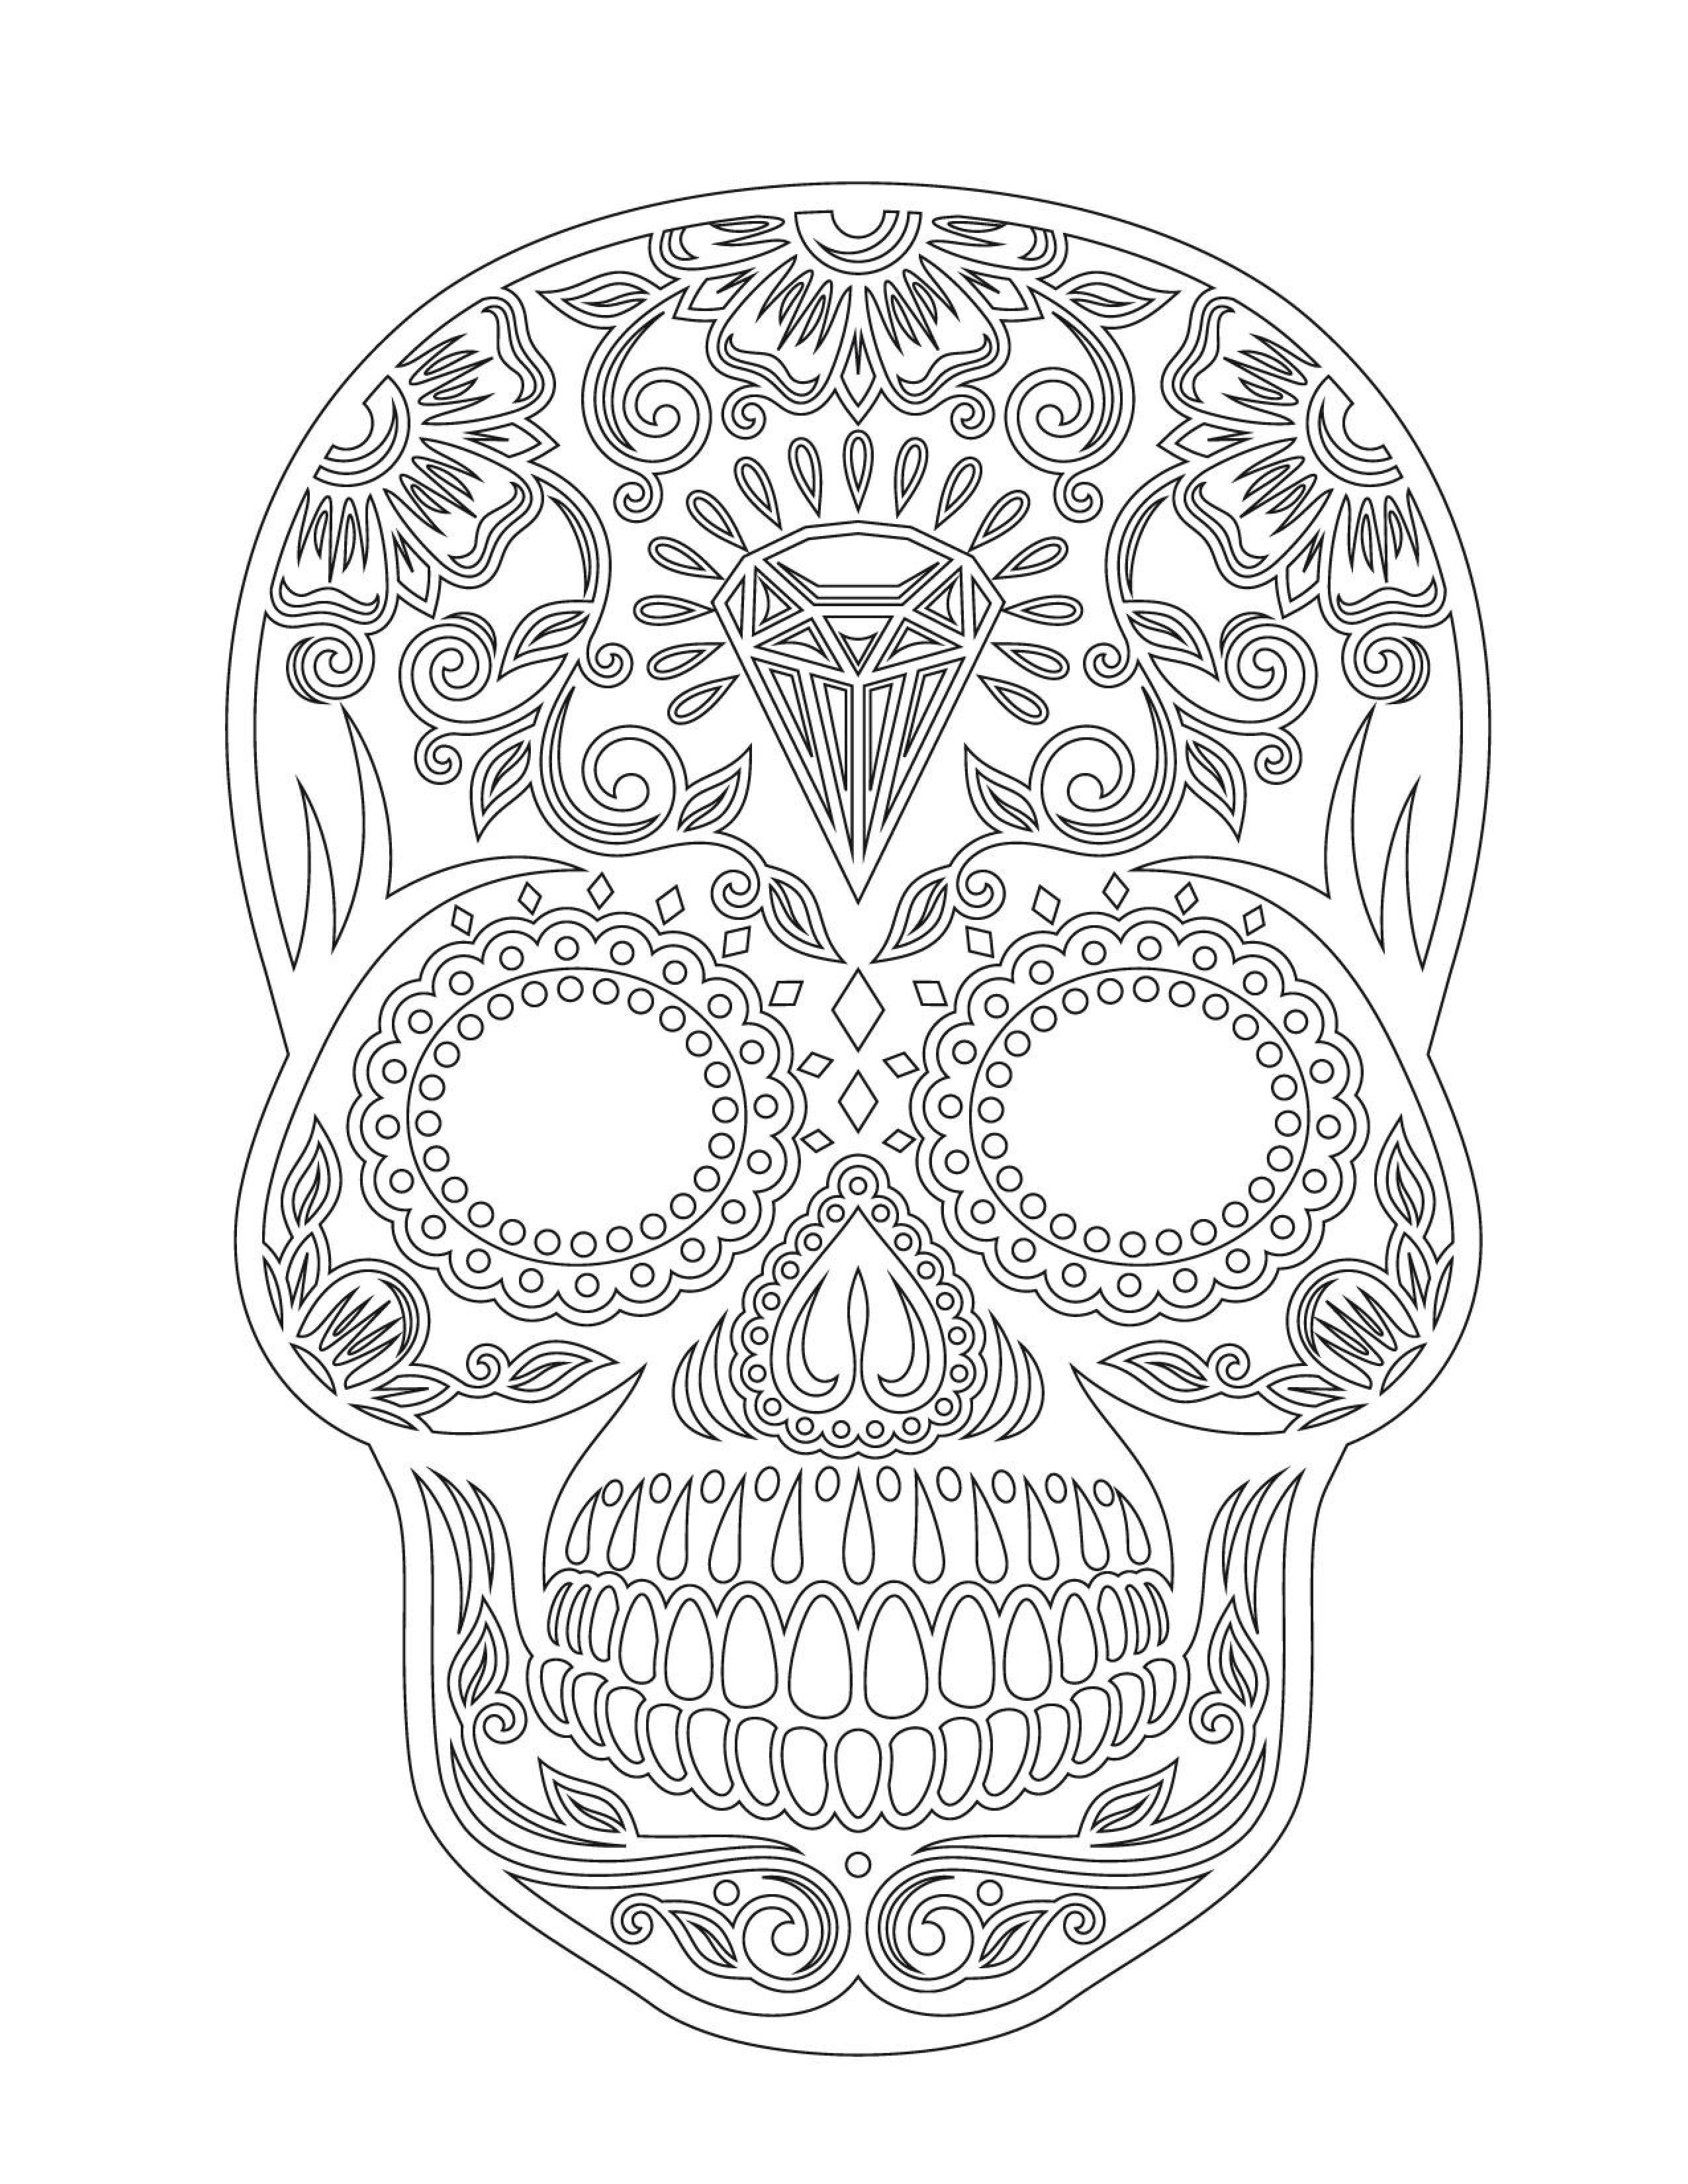 Pin de Małgorzata Kitka en Coloring pages to print - Skulls   Pinterest